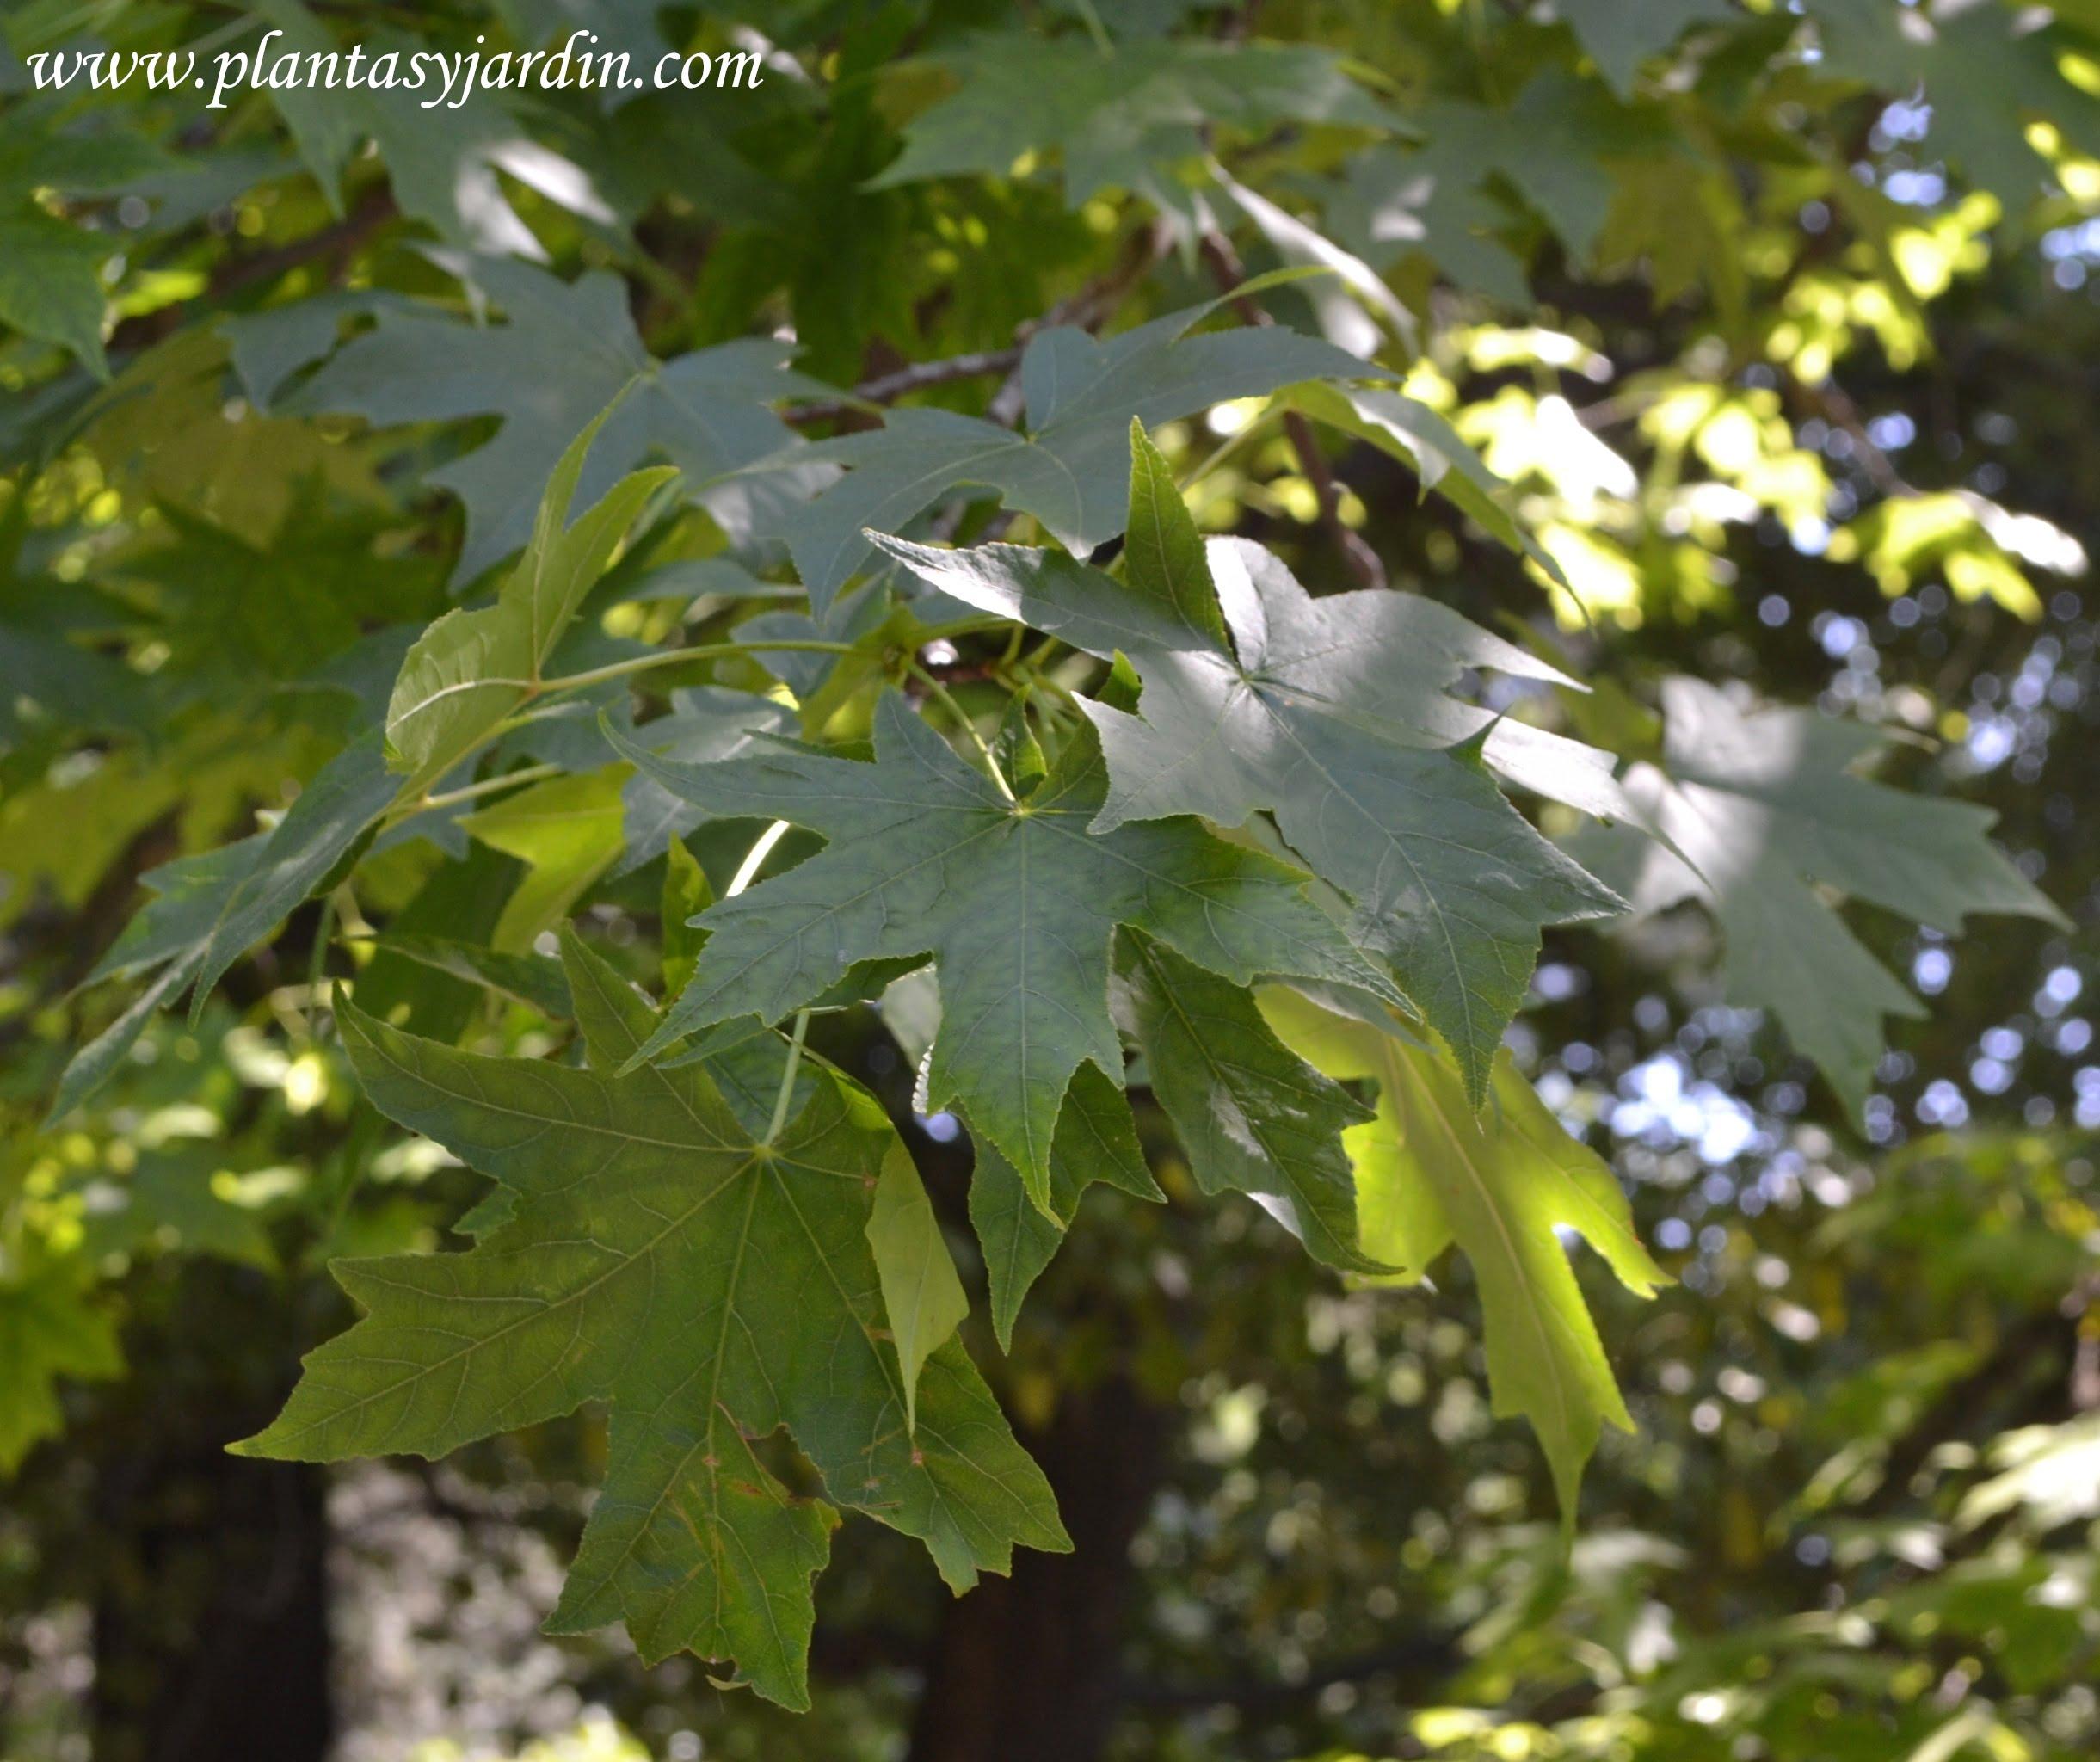 Liquidambar detalle follaje, hojas palmadas.